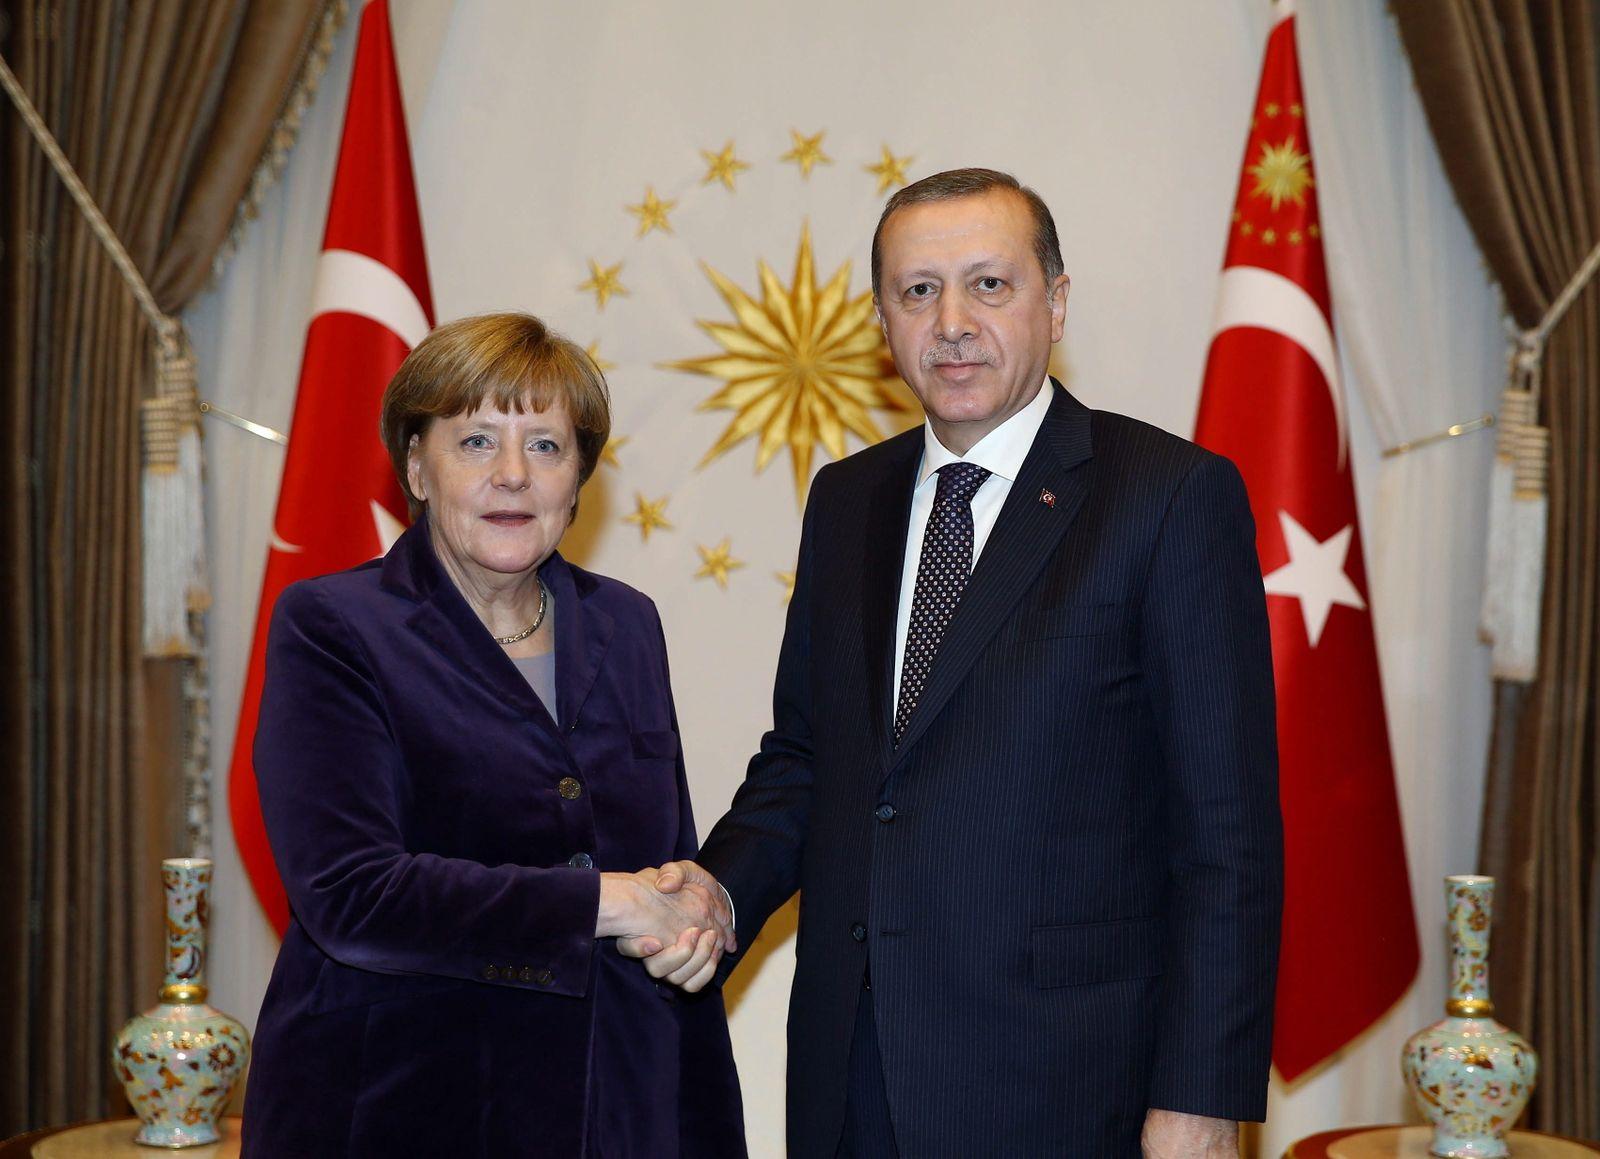 Angela Merkel/ Recep Tayyip Erdogan